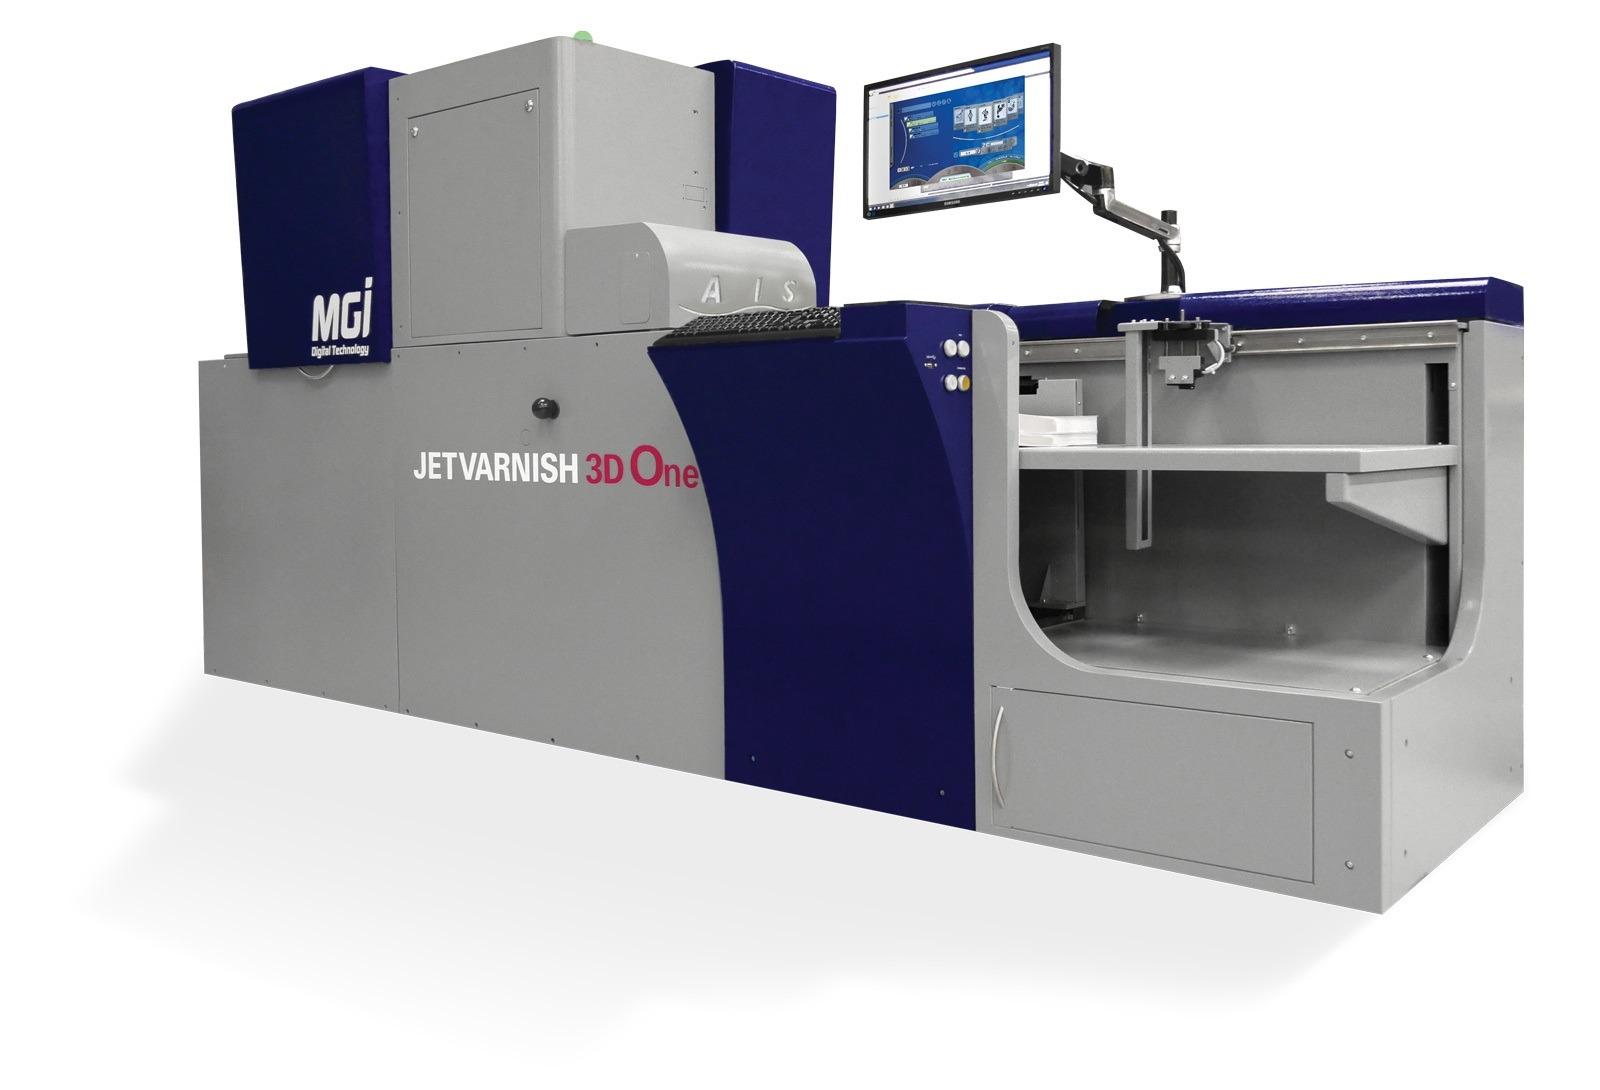 MGI-3D-One